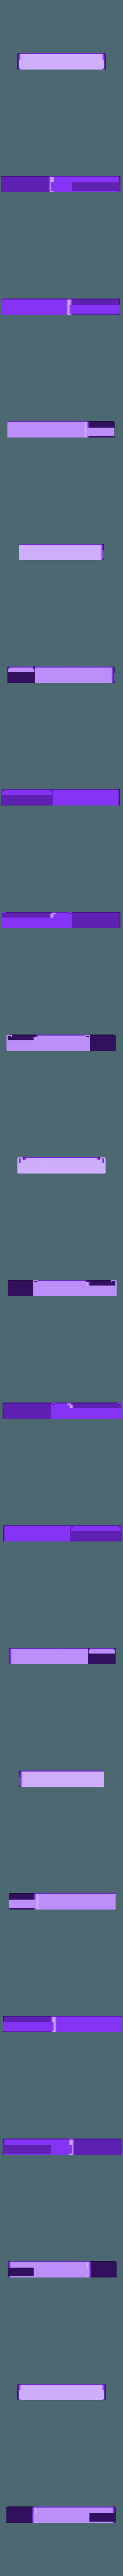 sFanHolderH.stl Download free STL file Fumey The Fume Extractor • 3D printer object, Adafruit